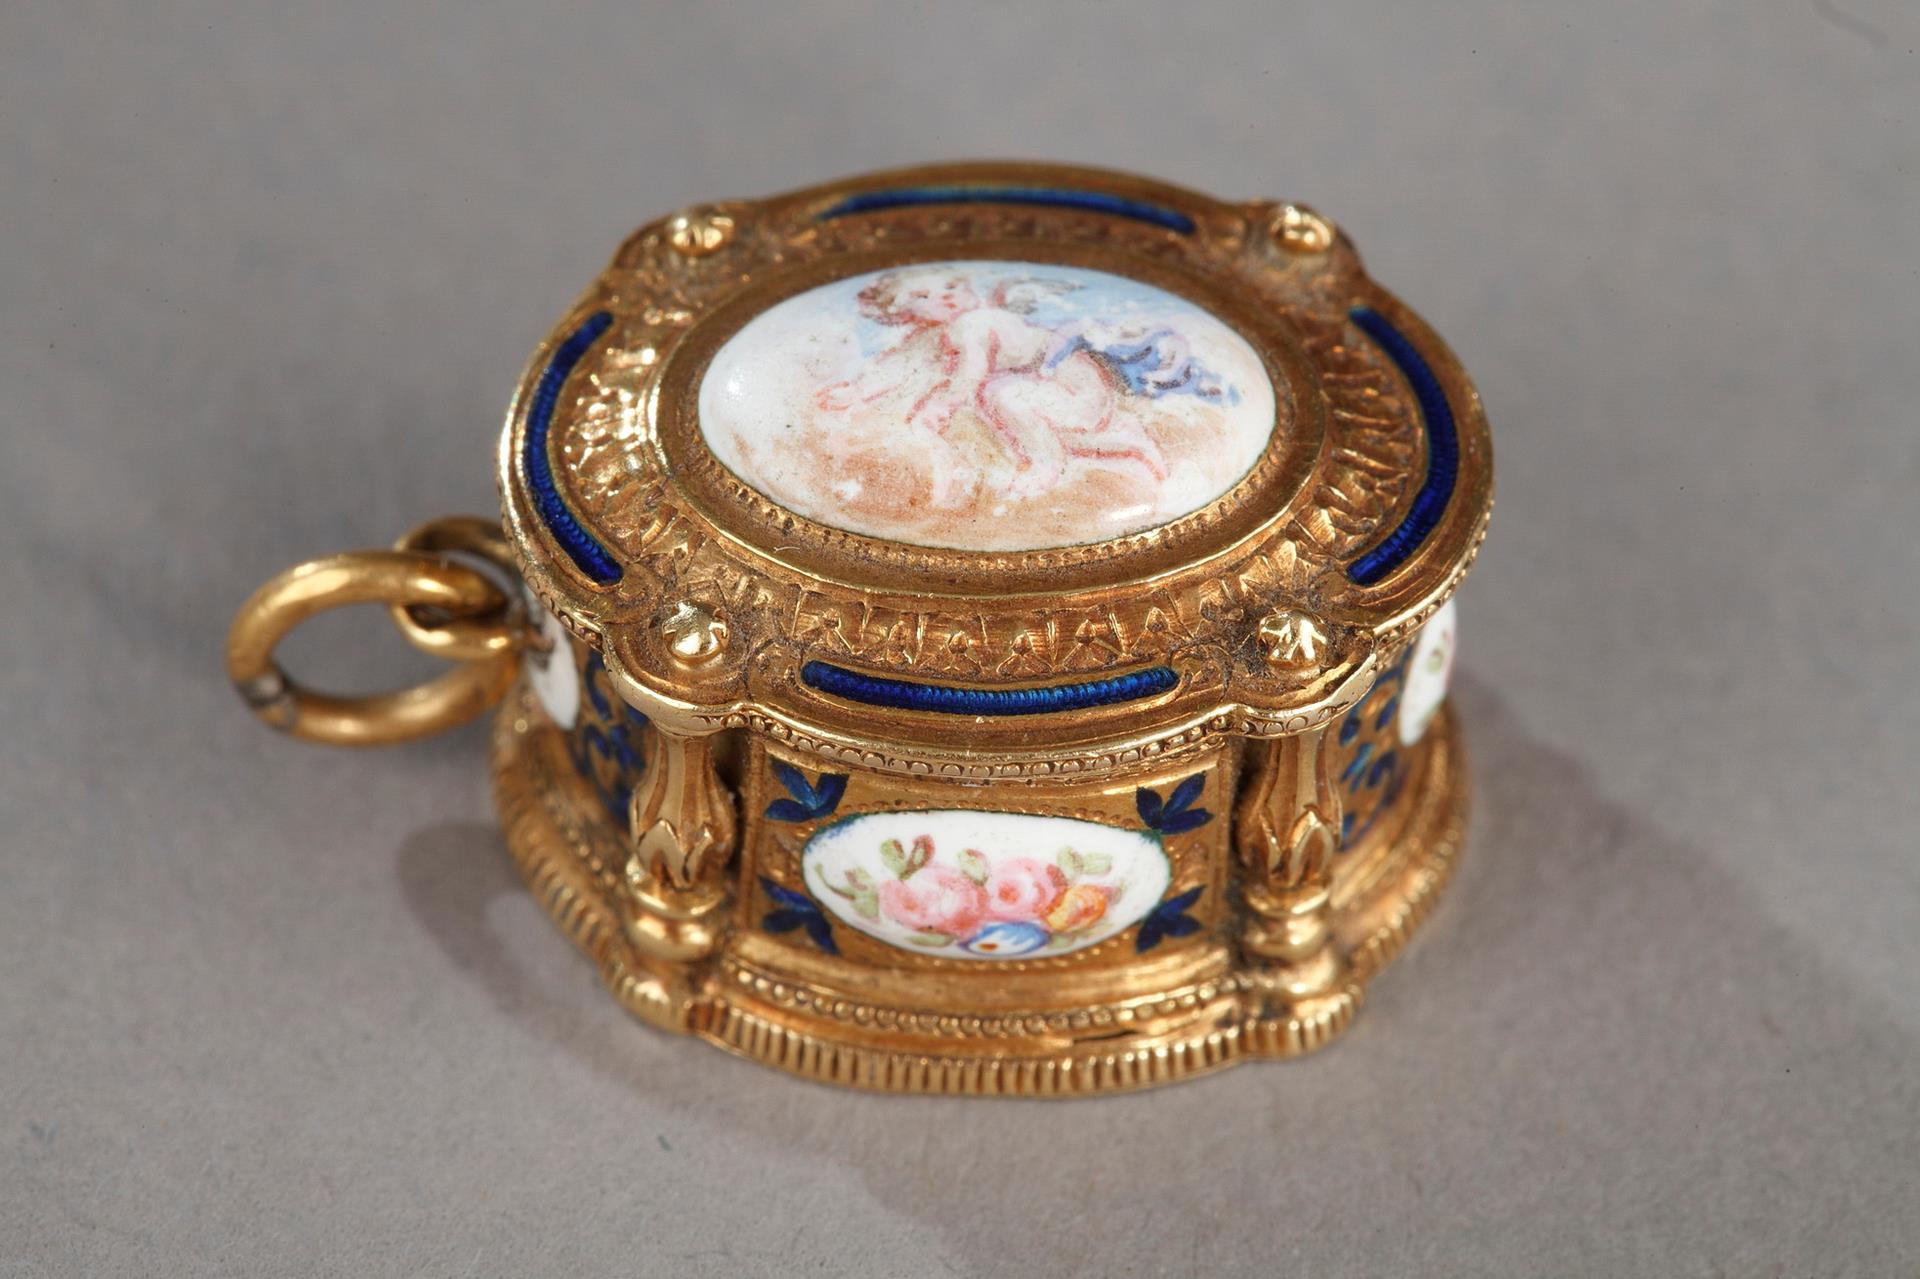 19th century Gold and enamel Box pendant.